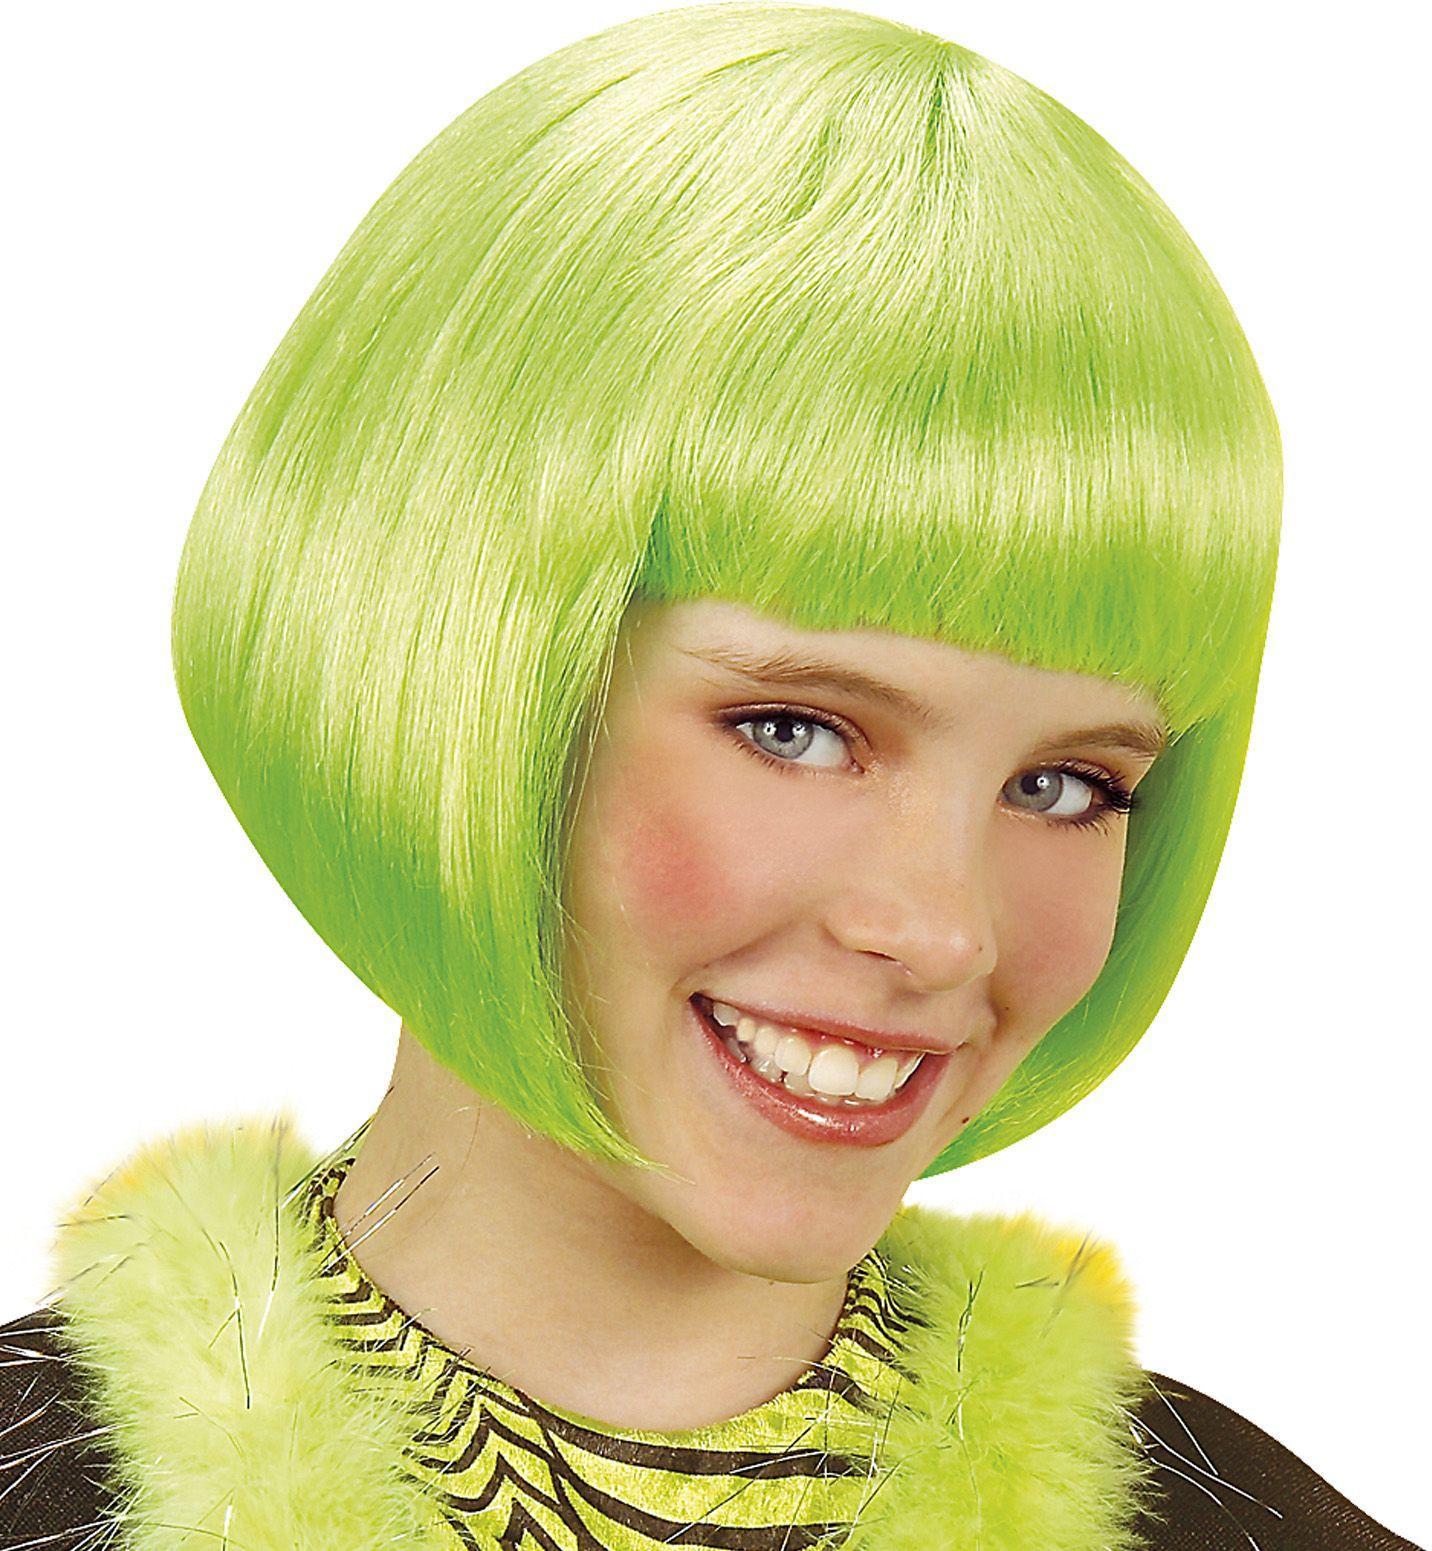 Groen Jenny kinder pruik